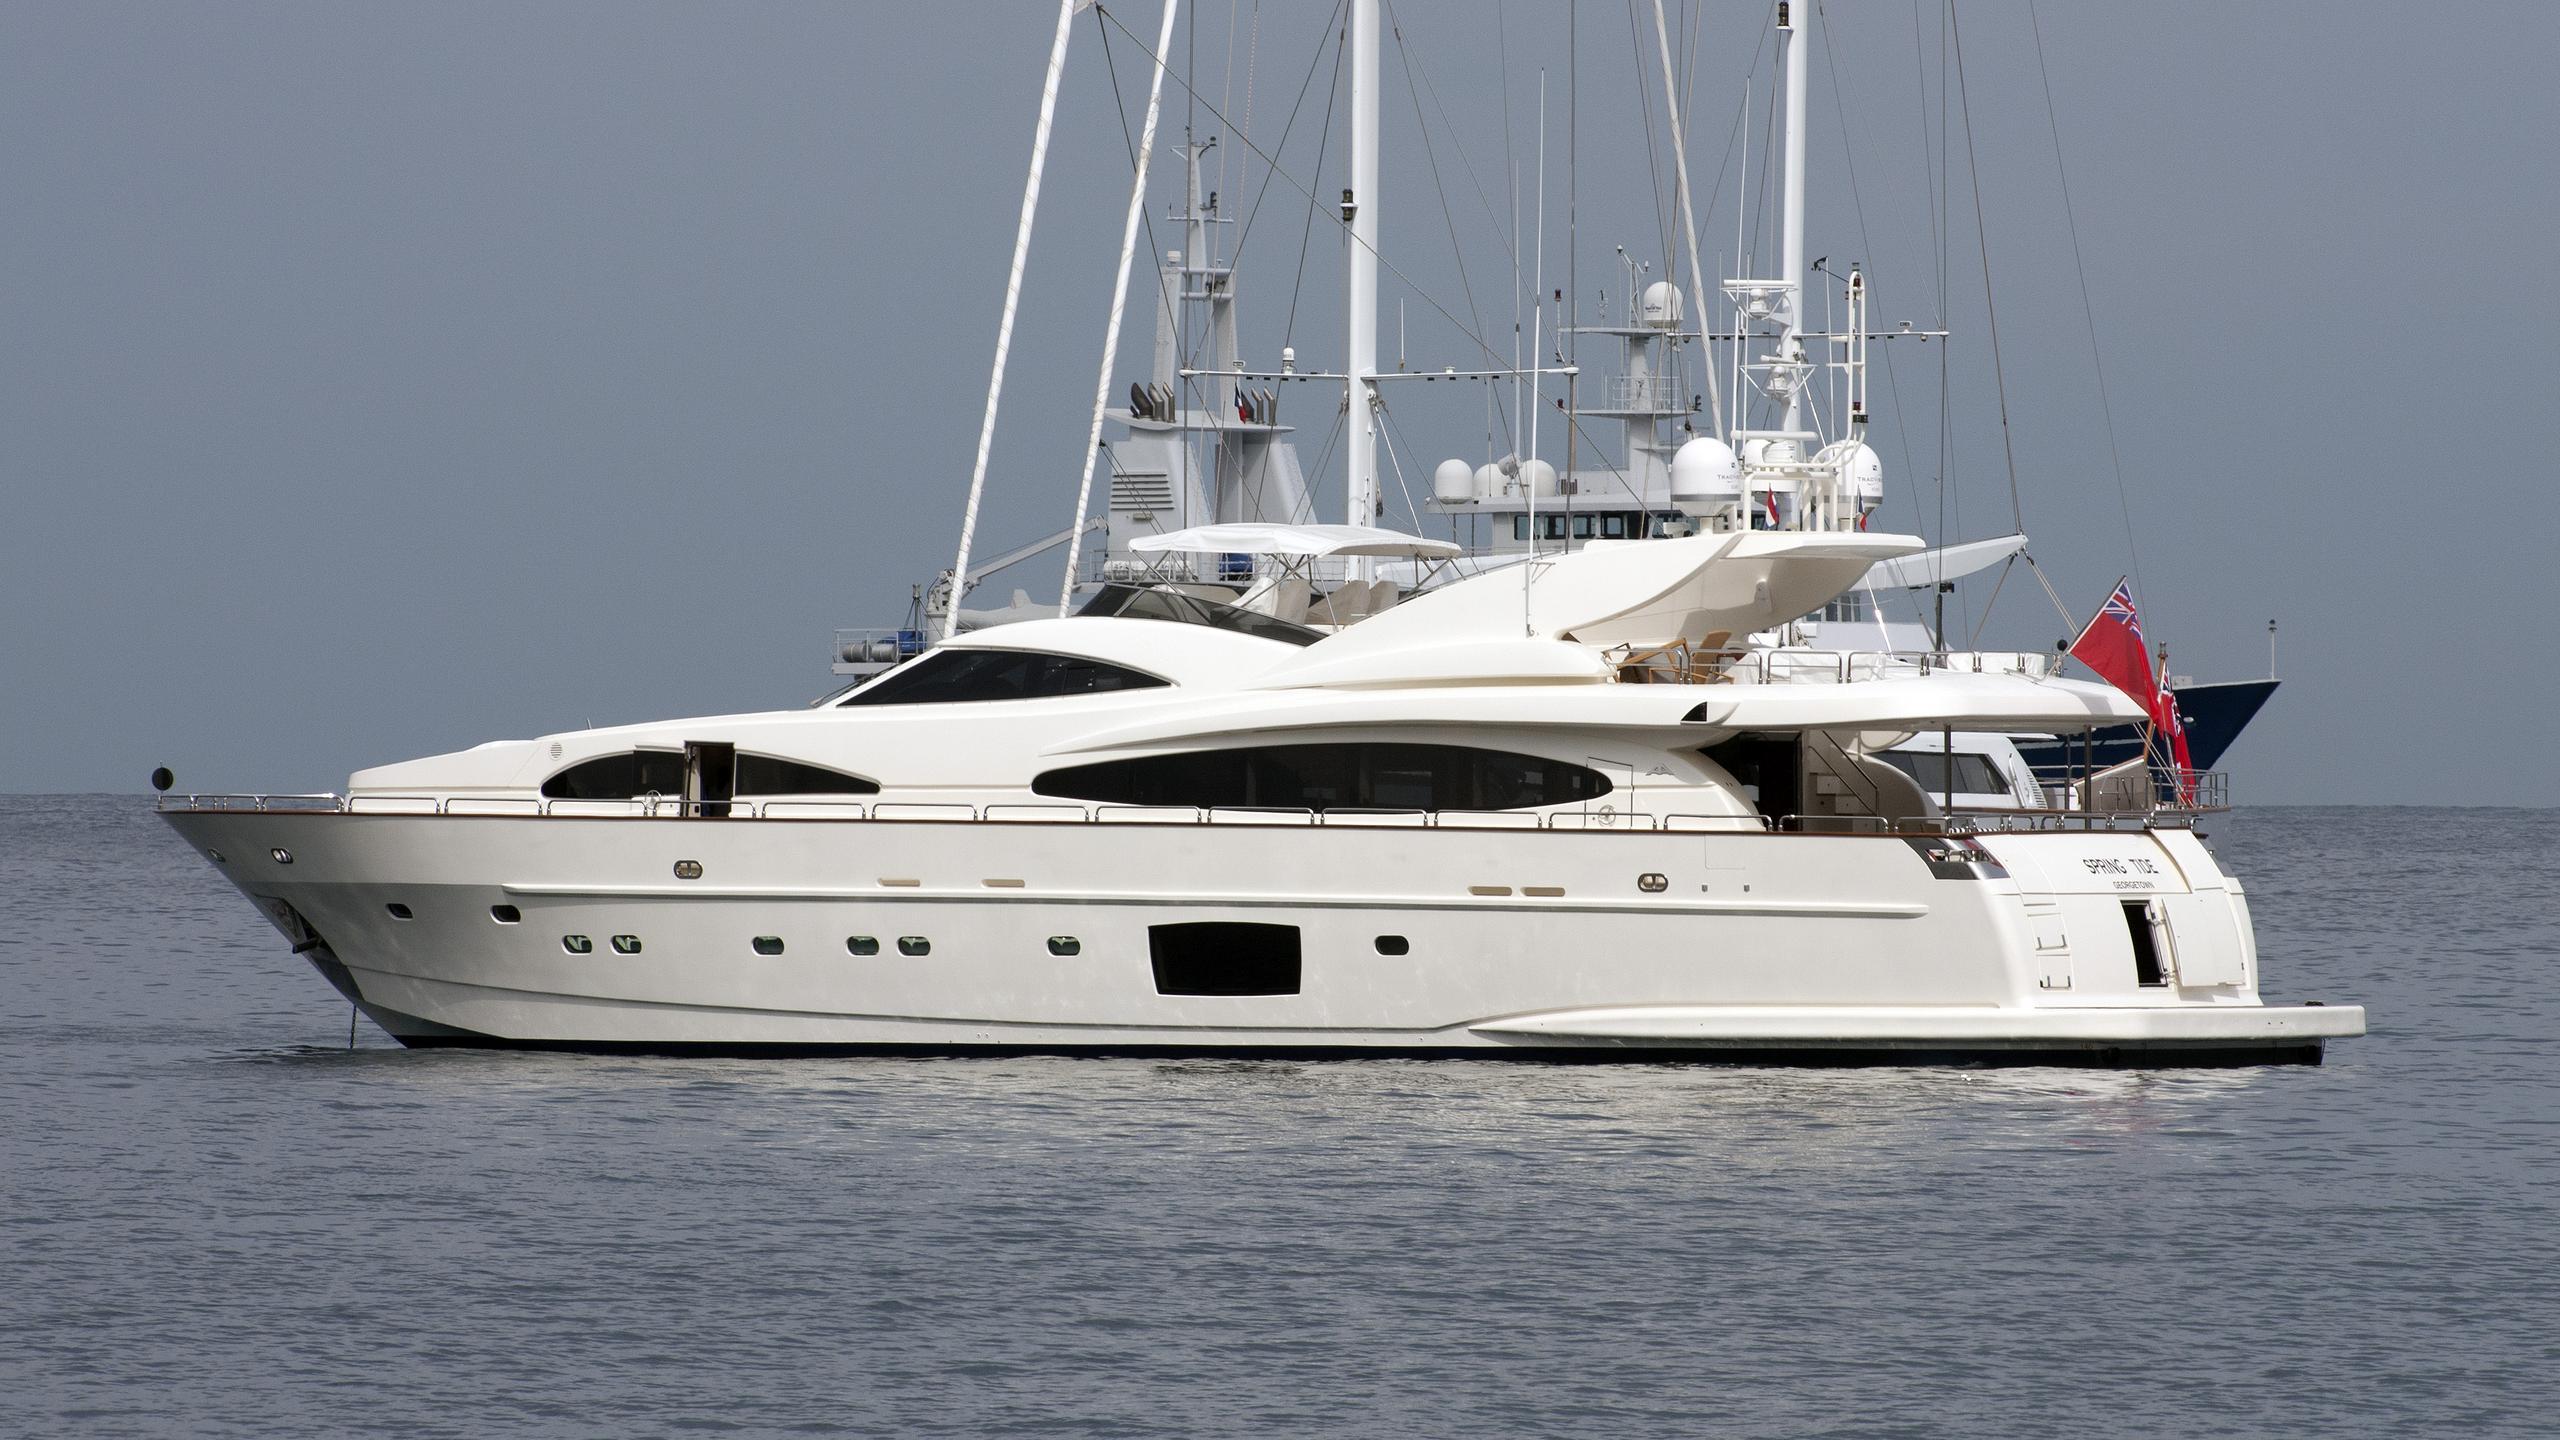 spring-tide-motor-yacht-astondoa-2007-31m-profile